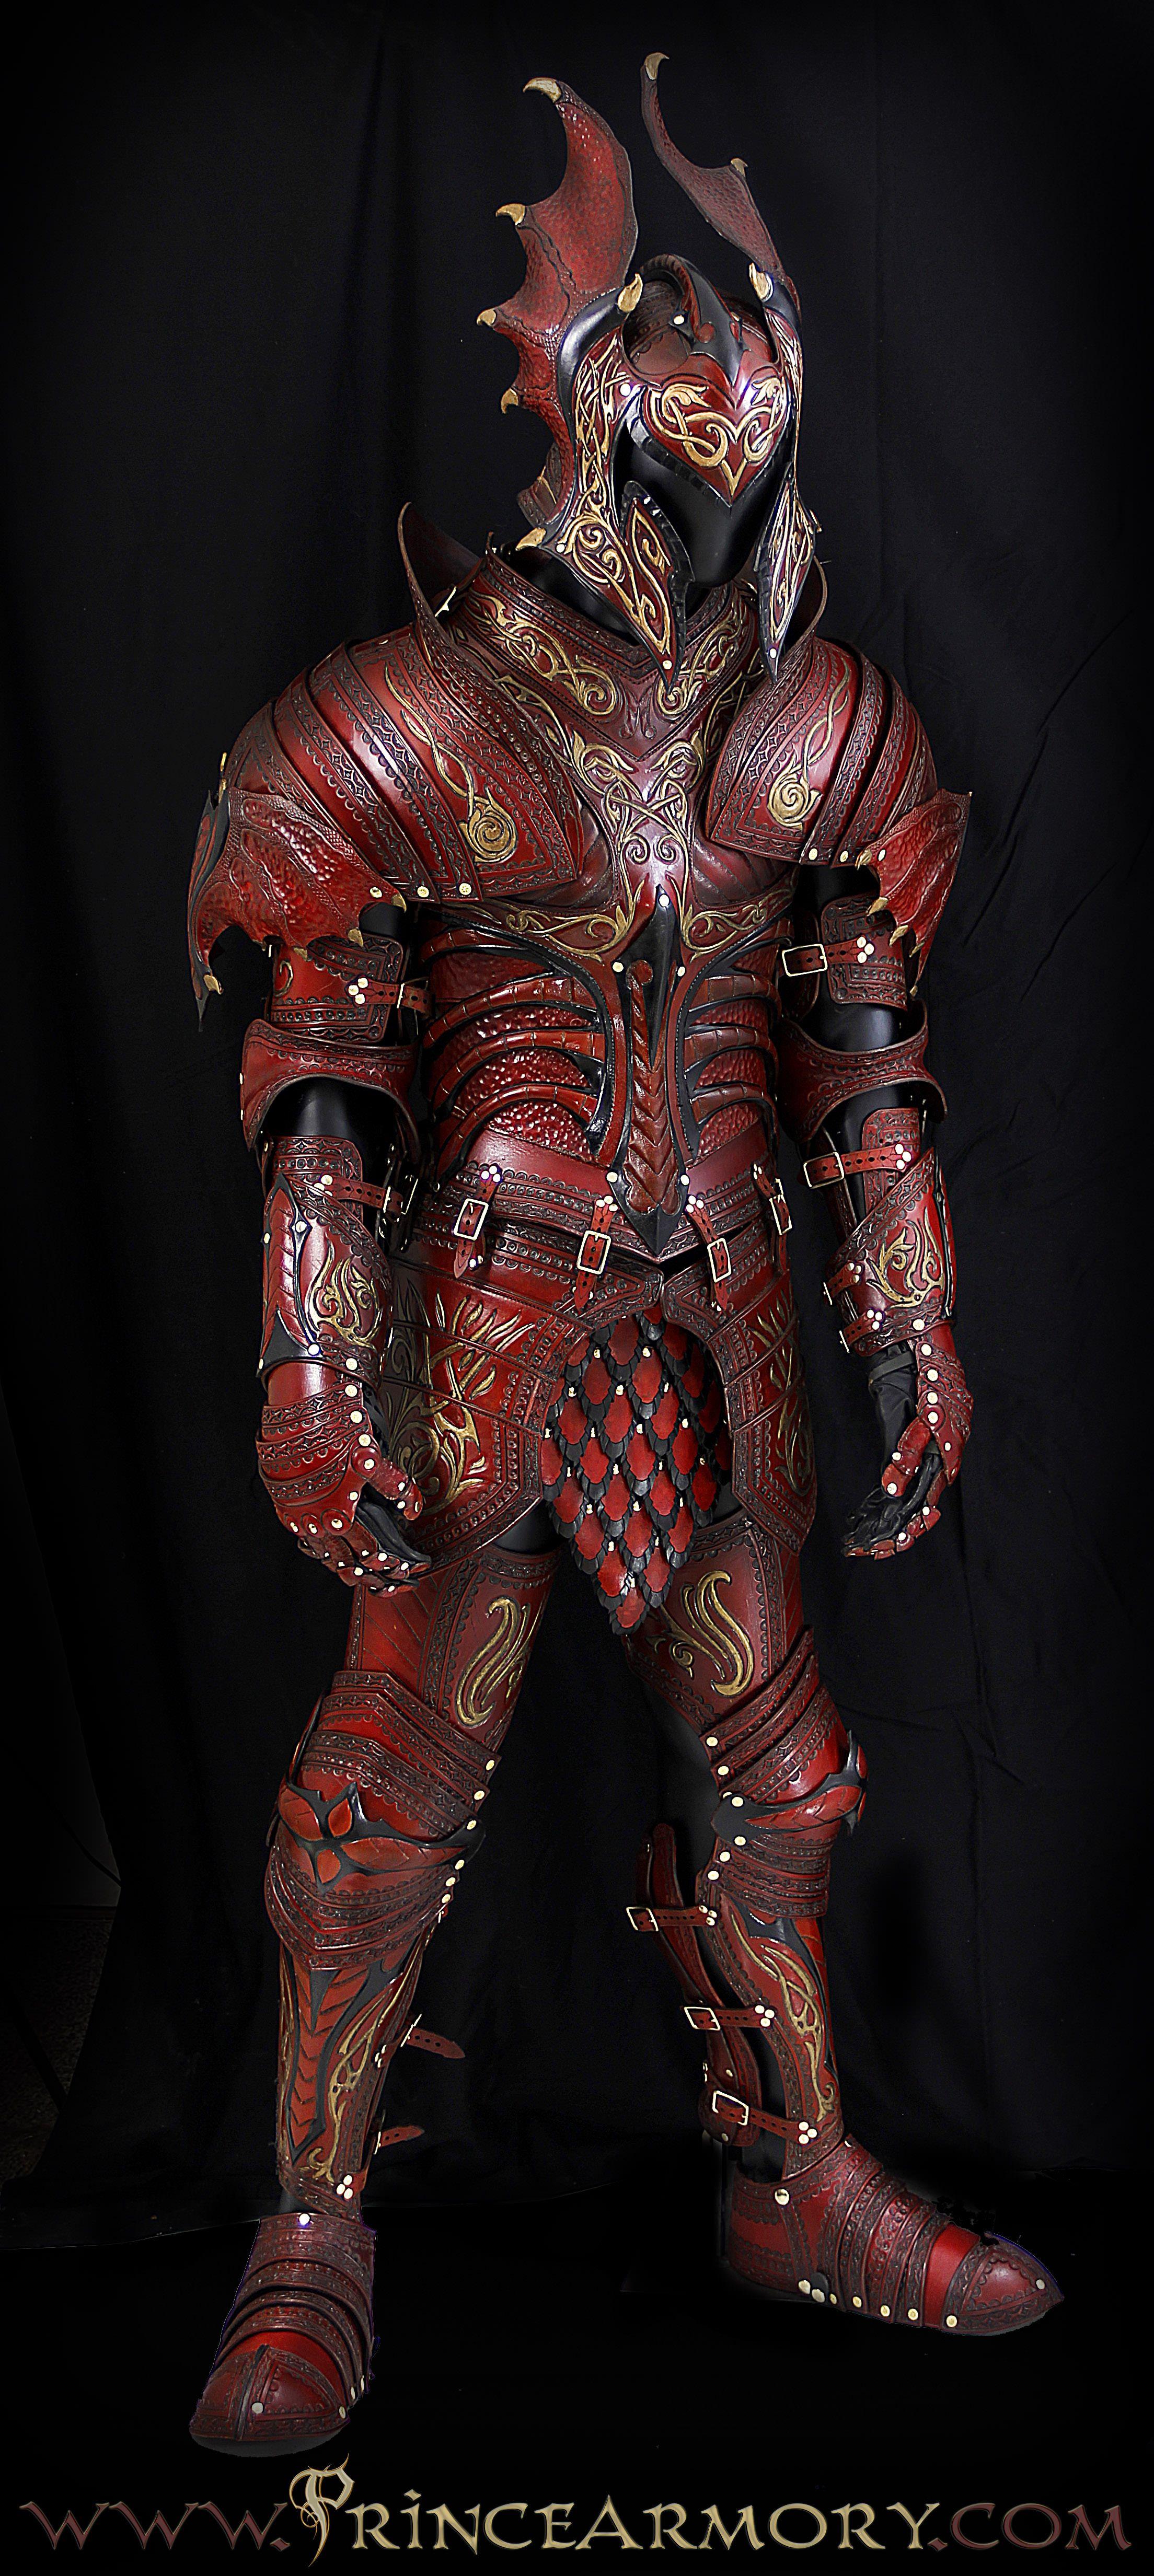 Prince Armory In 2020 Dragon Armor Leather Armor Fantasy Armor Flame dragon armor by azmal on deviantart. pinterest